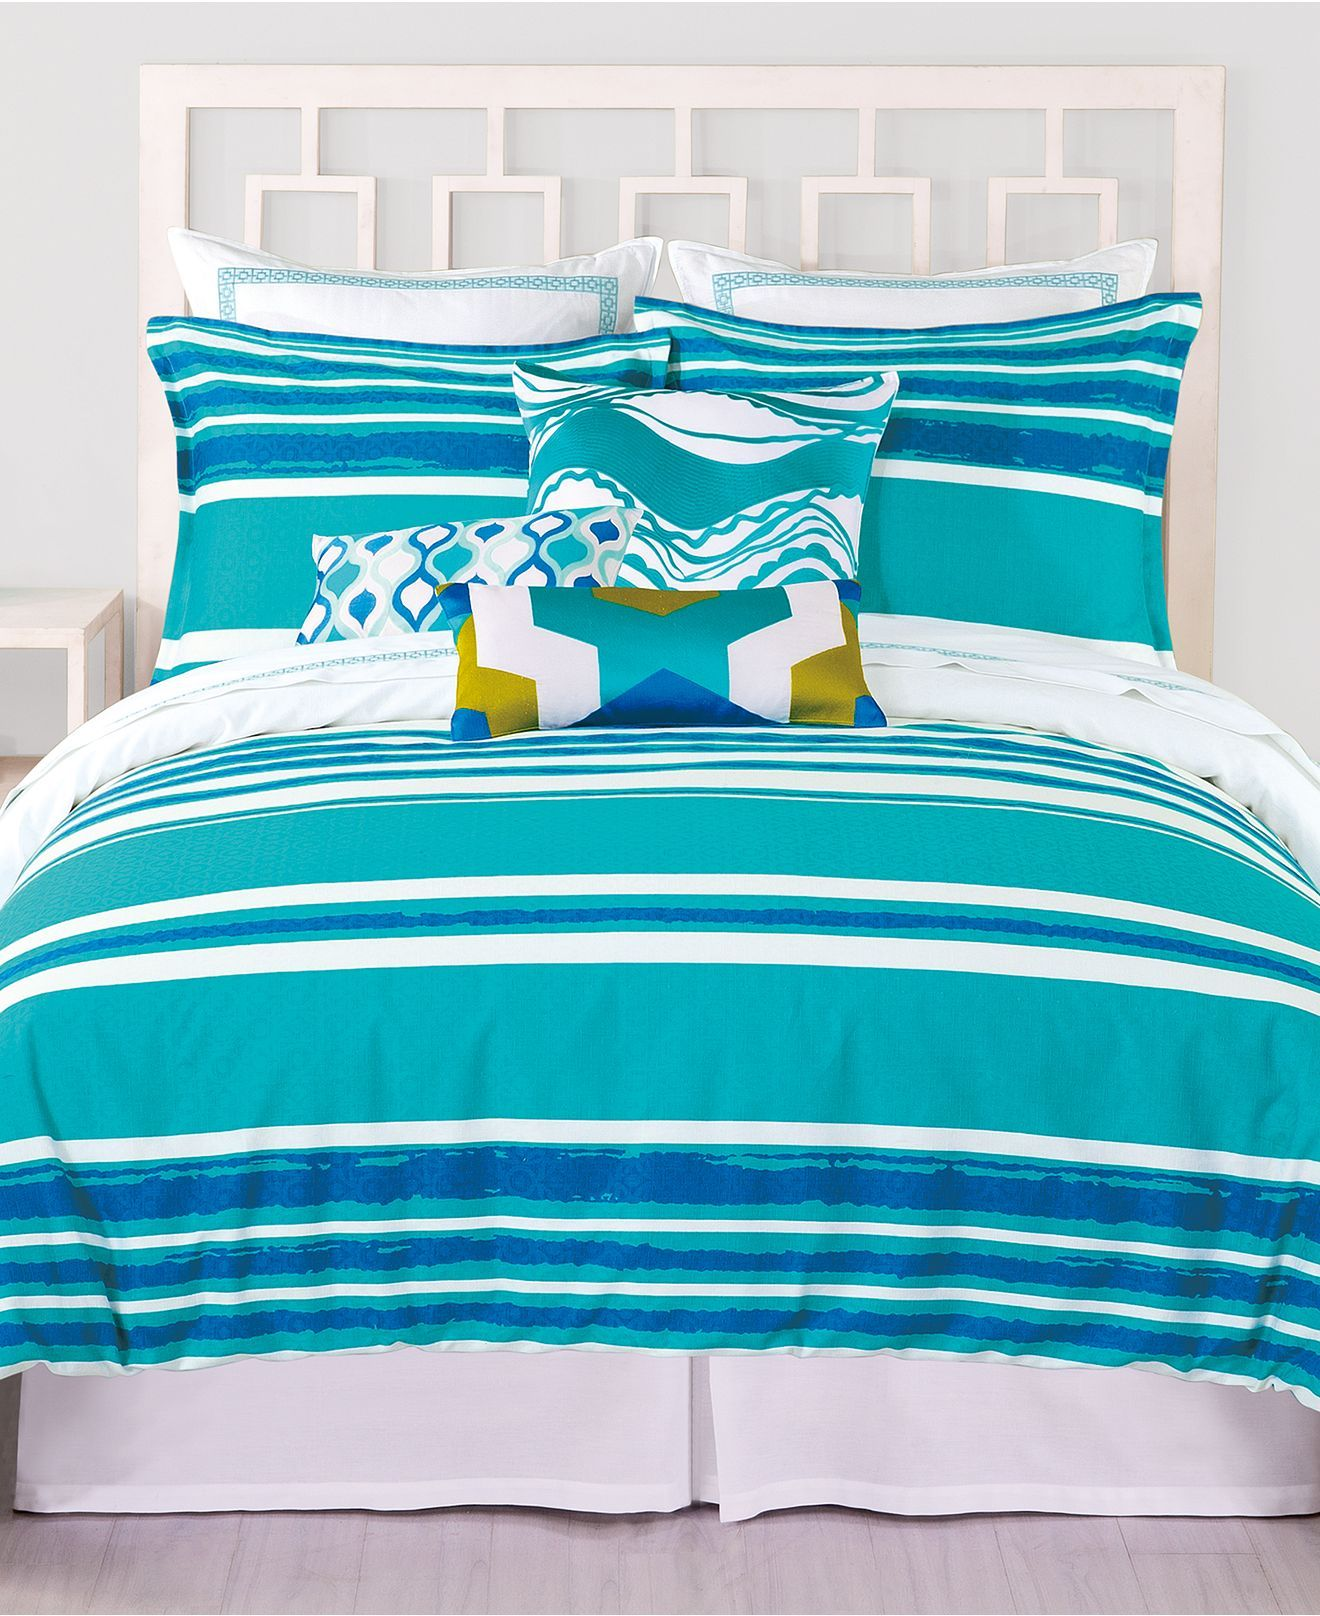 Trina Turk Bedding Horizon Stripe Comforter And Duvet Sets